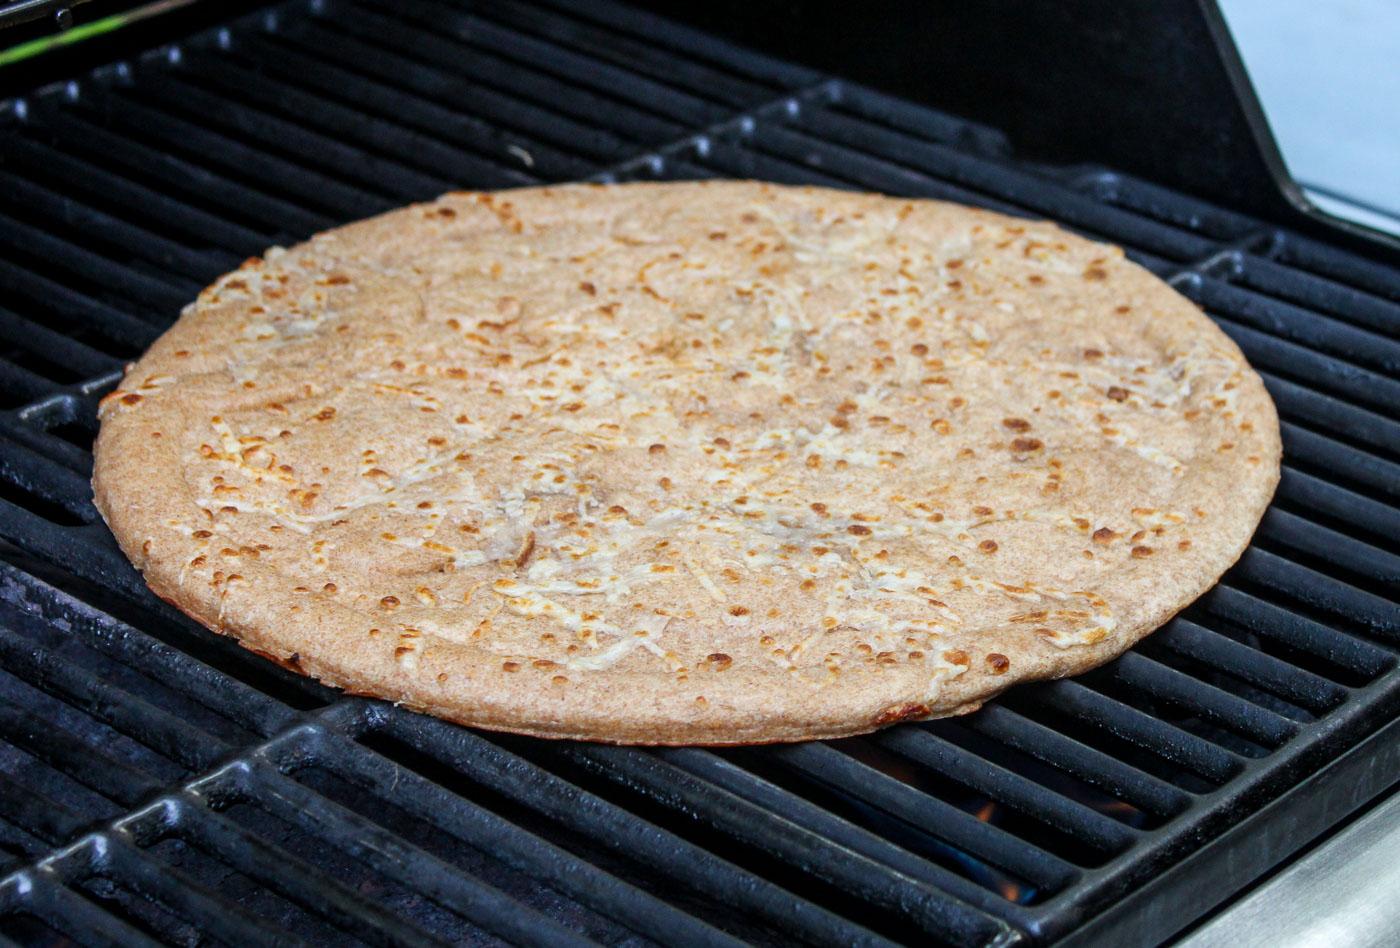 Pizza Crust on Grill - Grilled Corn Pesto Pizza